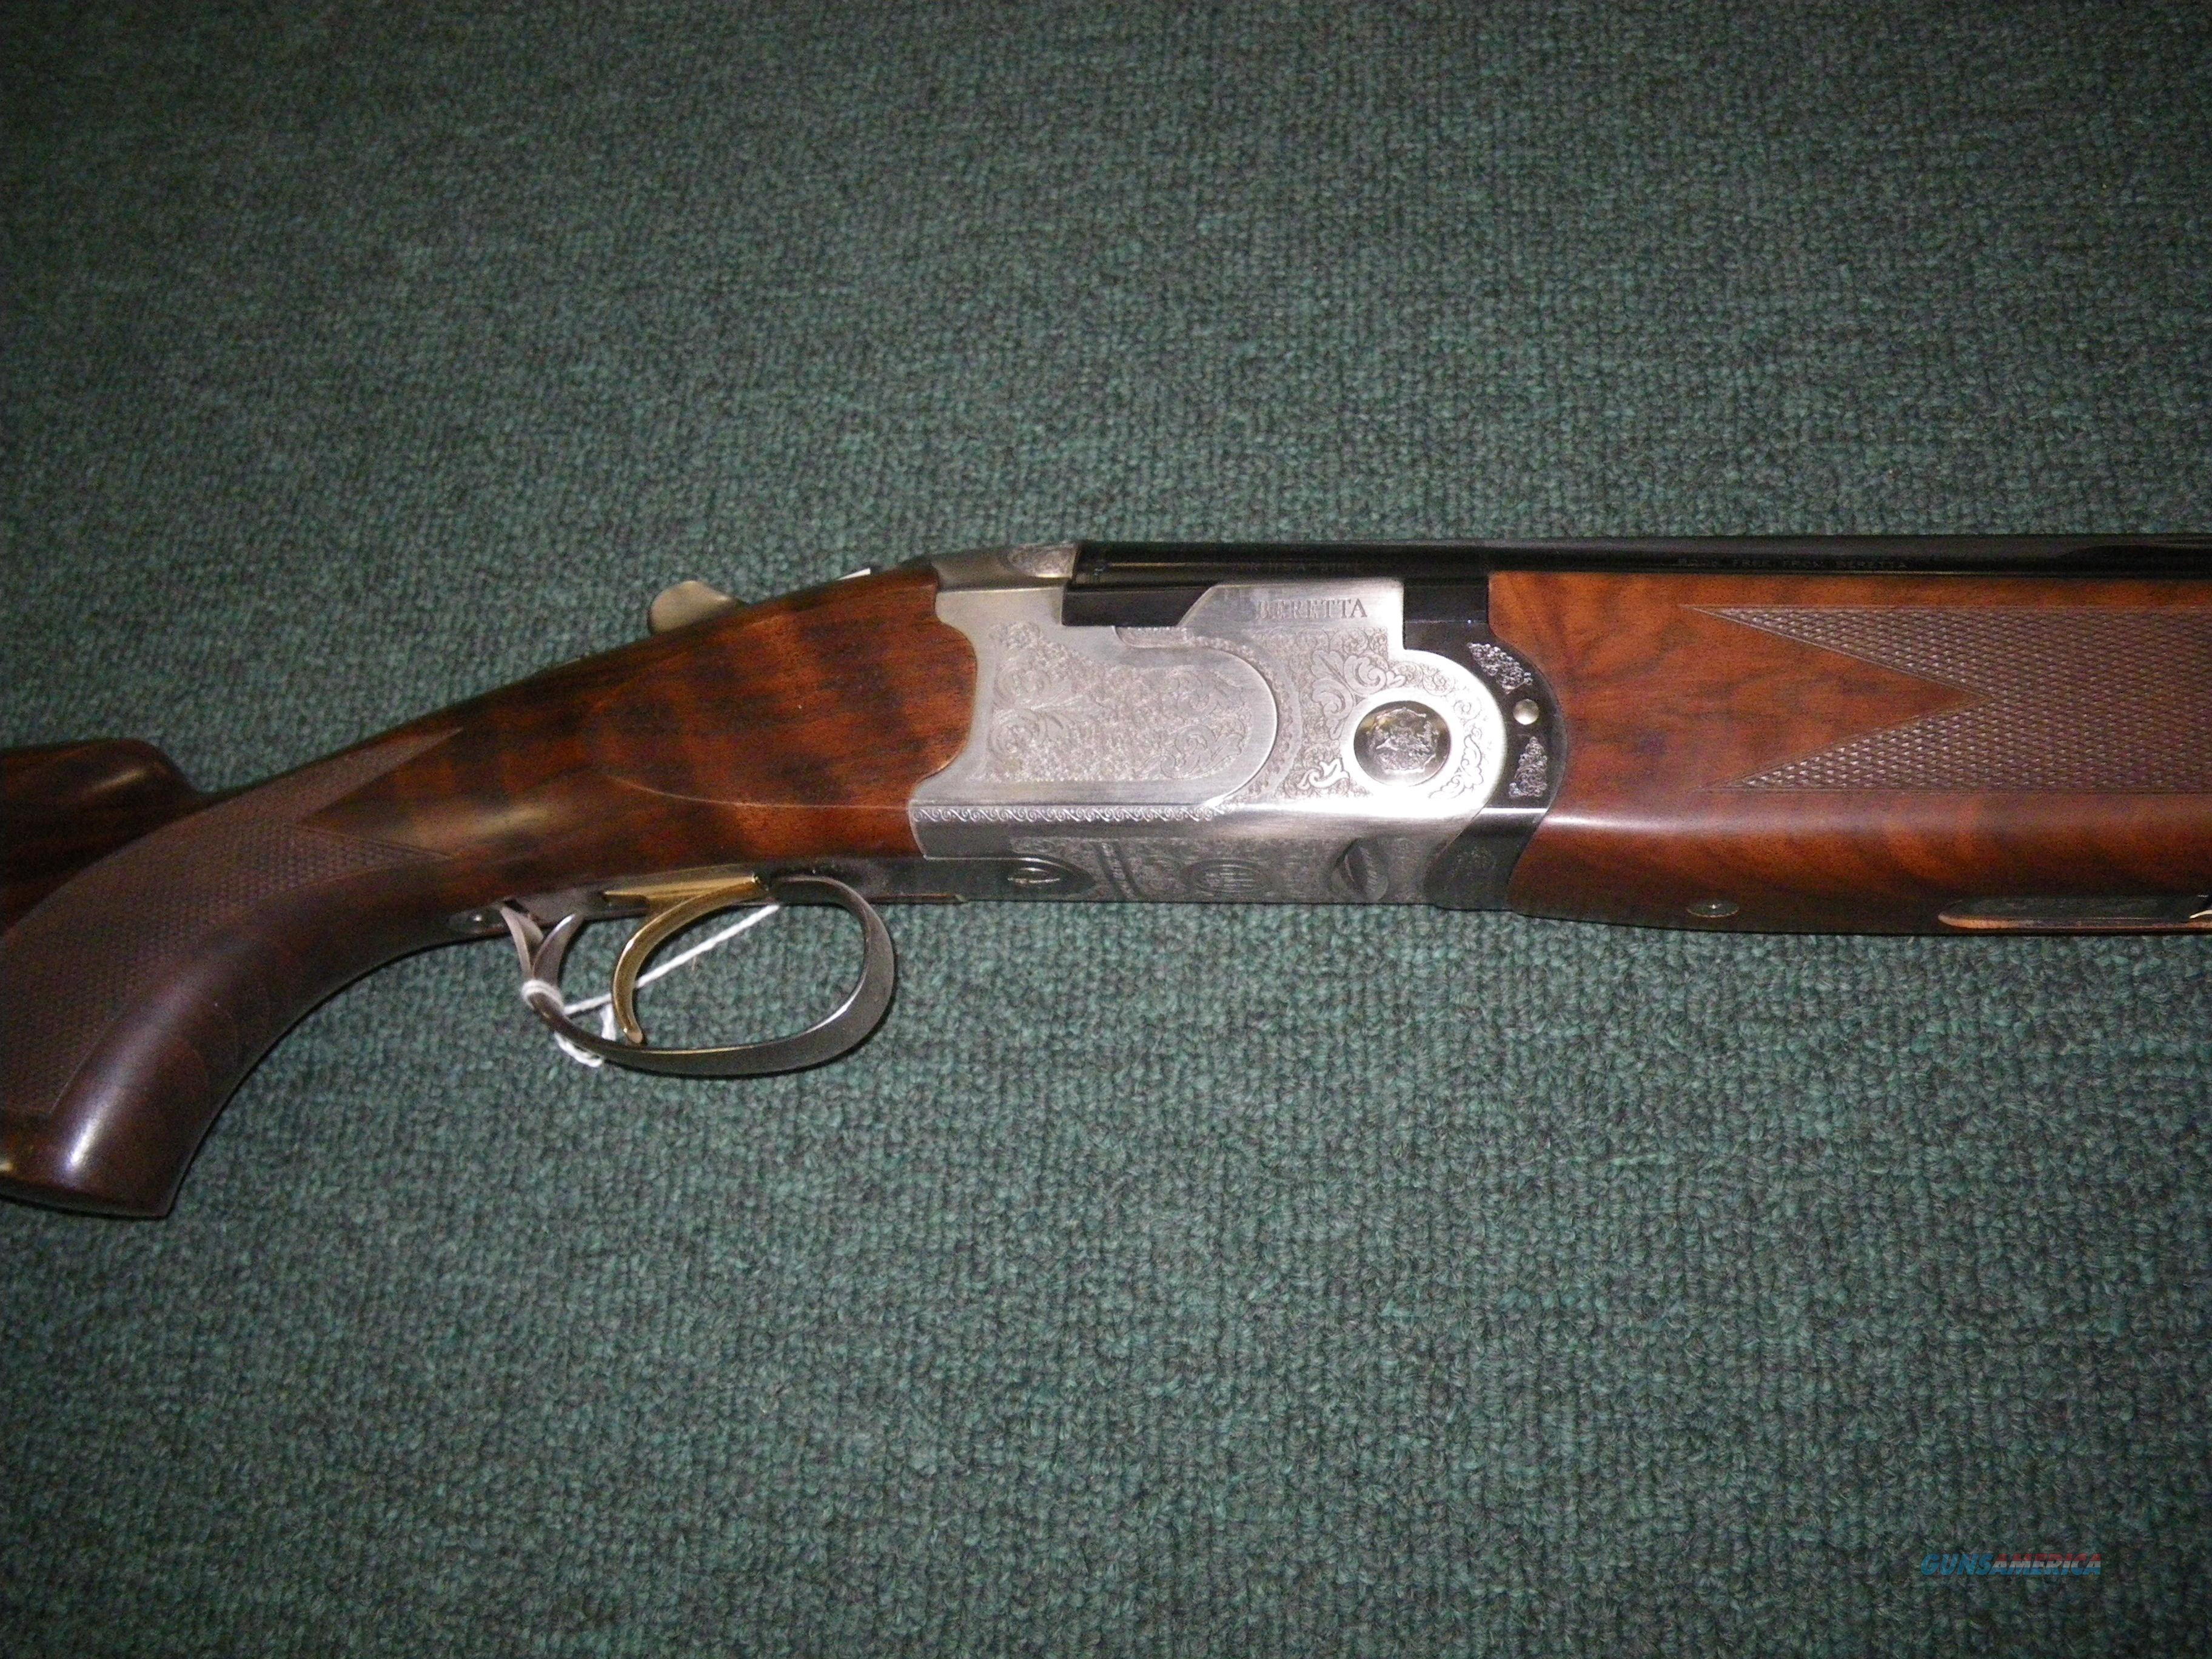 "Beretta 686 Silver Pigeon I 20ga 30"" Over Under J6863K0  Guns > Shotguns > Beretta Shotguns > O/U > Hunting"